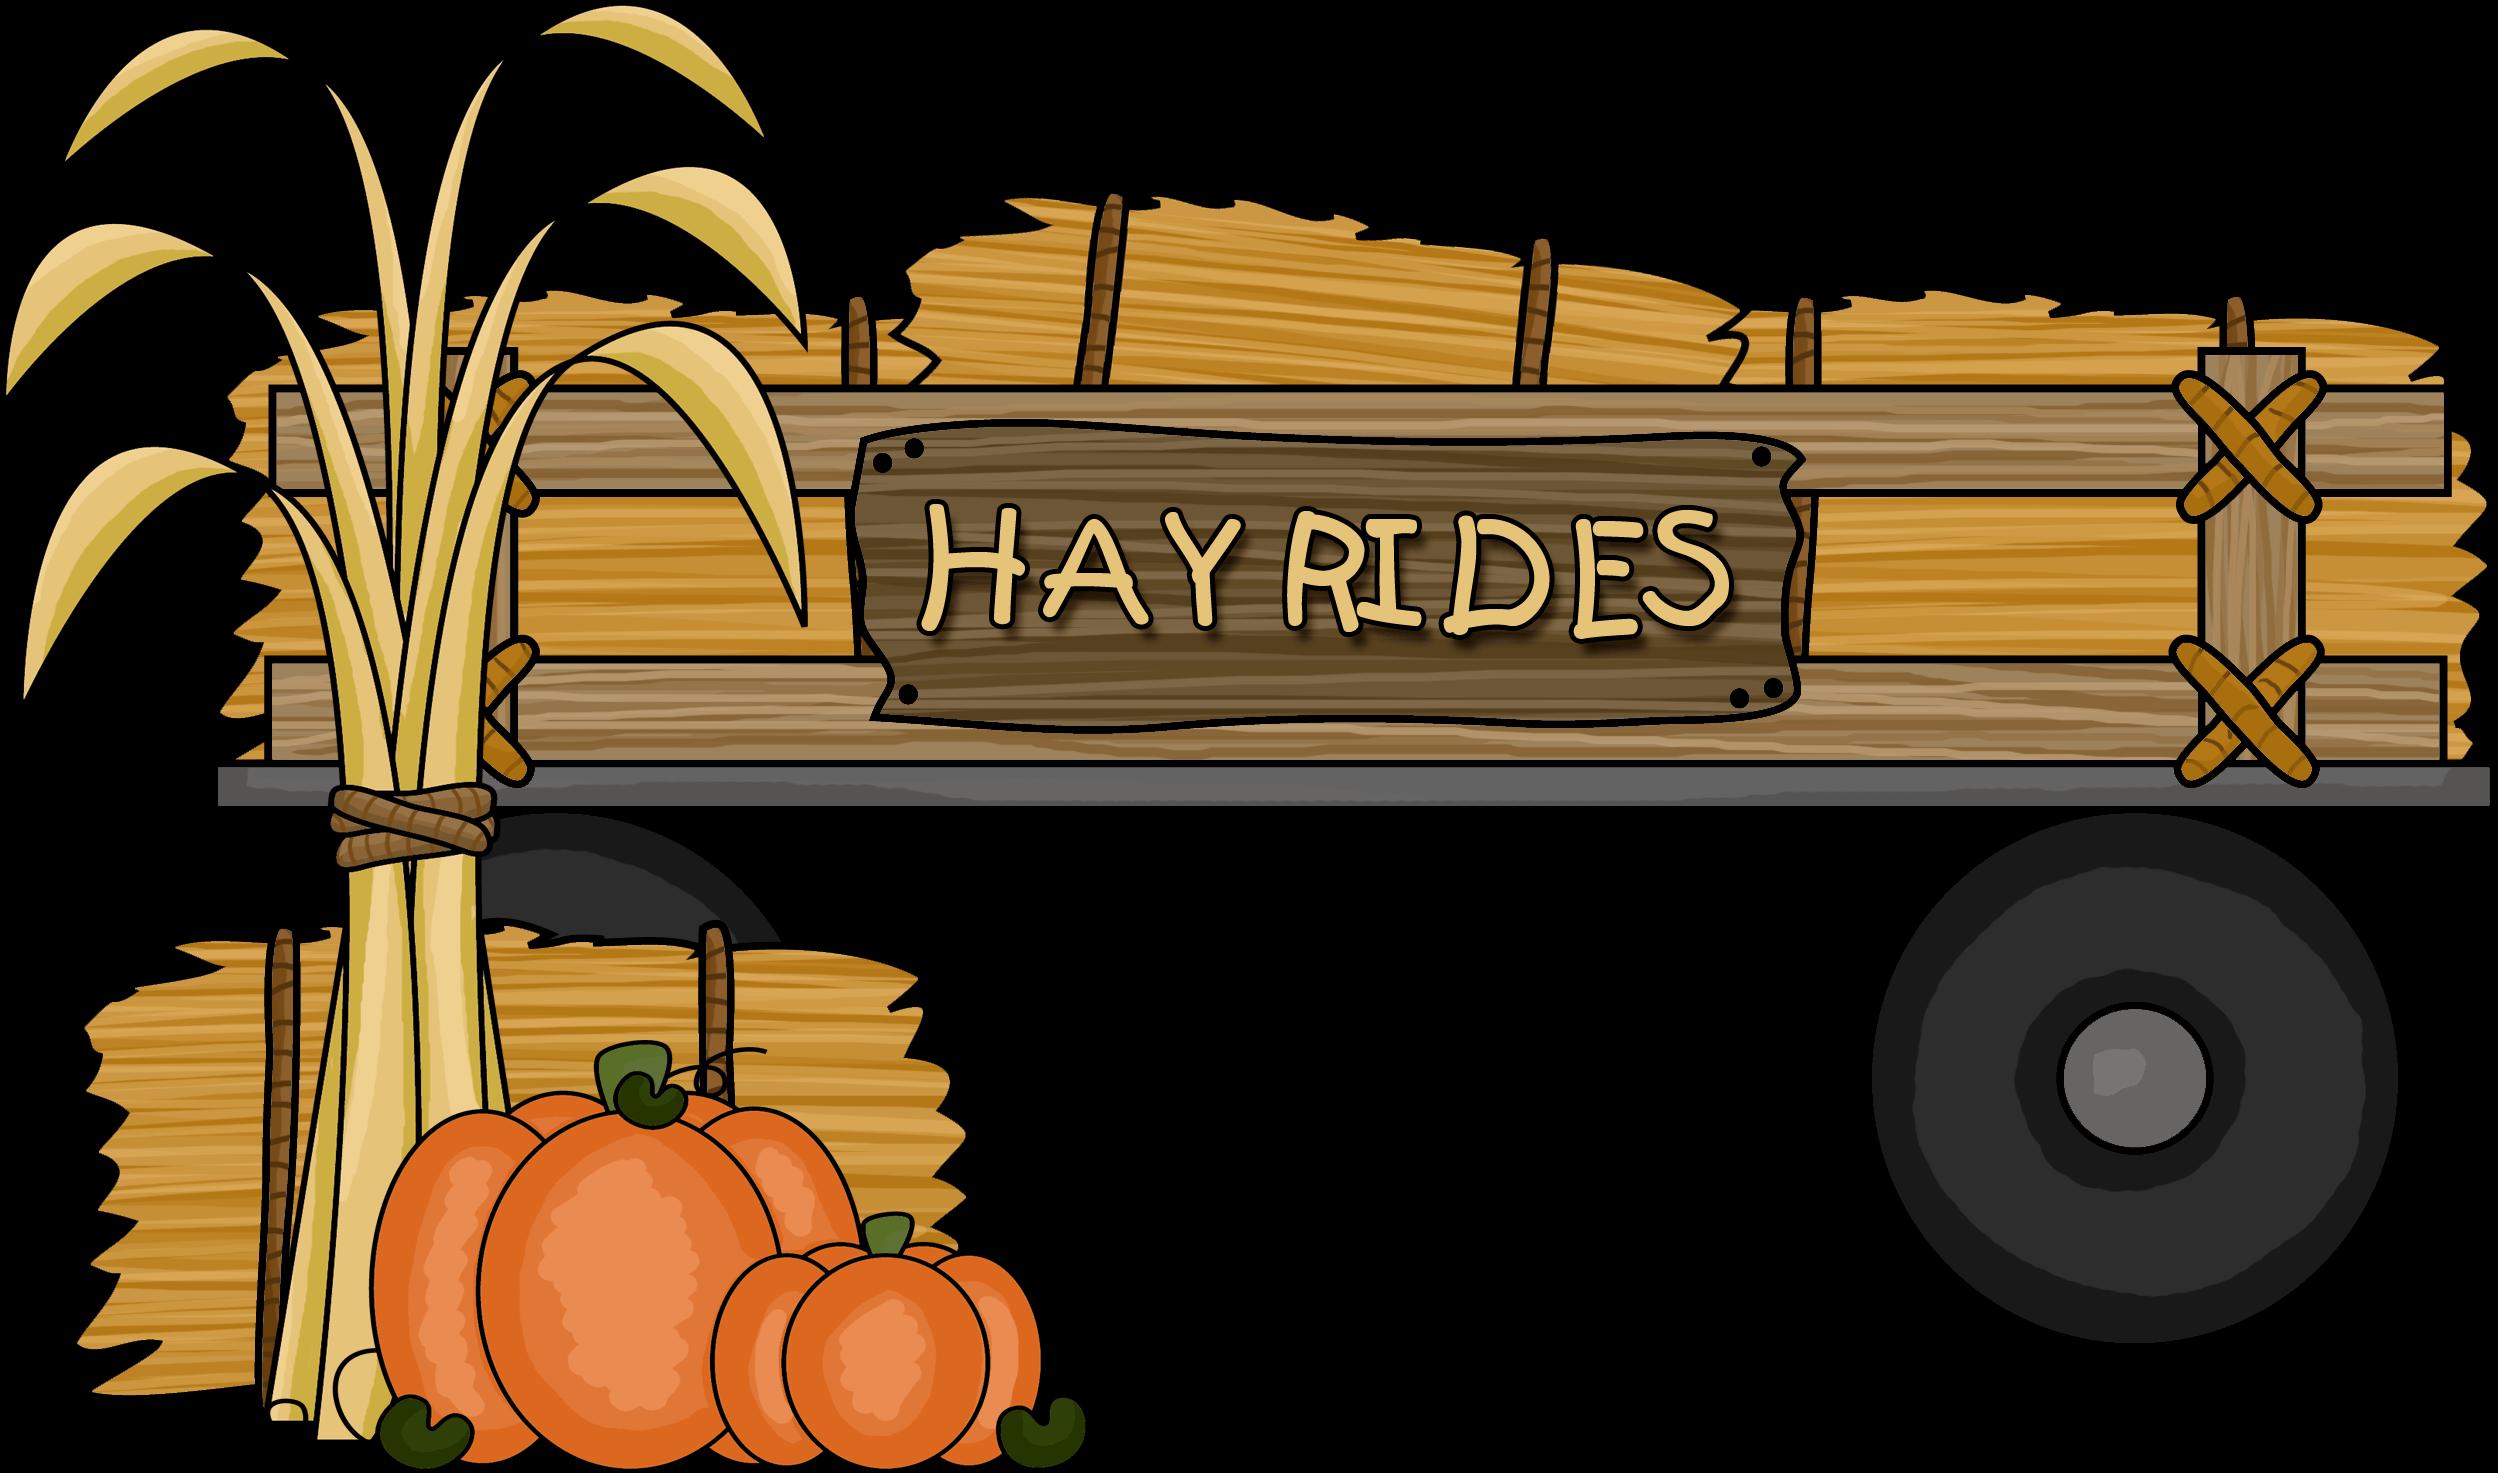 Hayride clipart wagon, Hayride wagon Transparent FREE for.